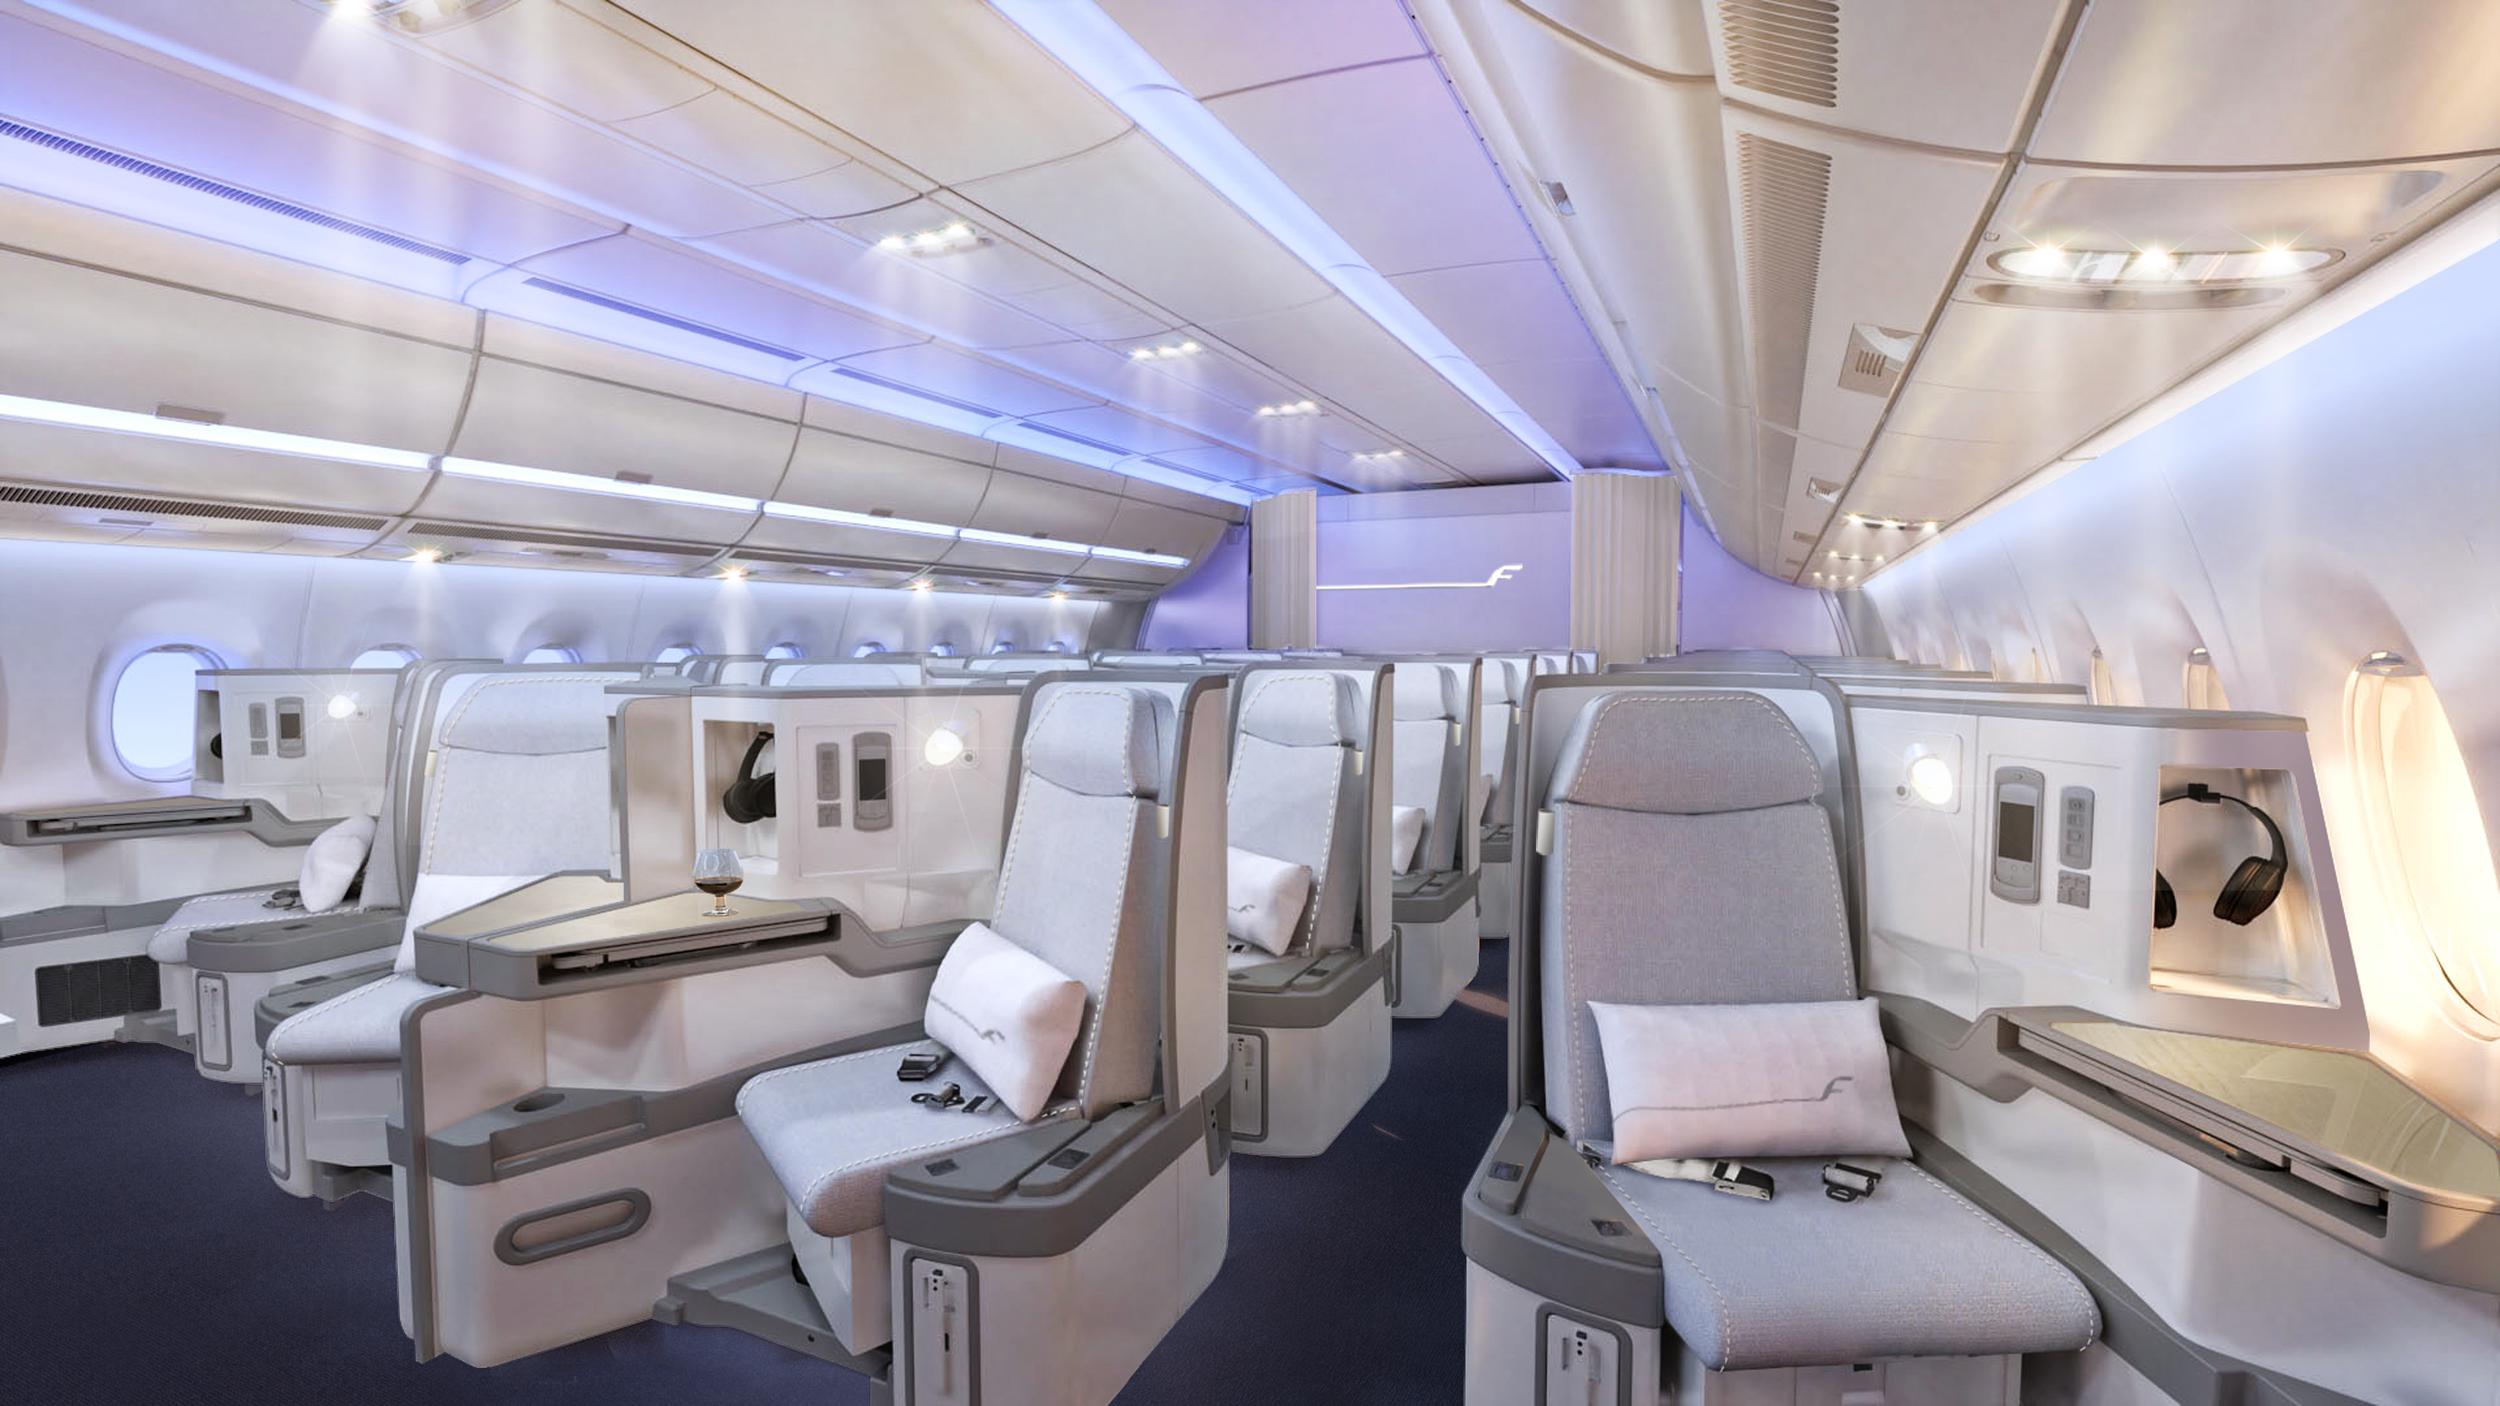 All is quiet in the skies. (image credit: Finnair)